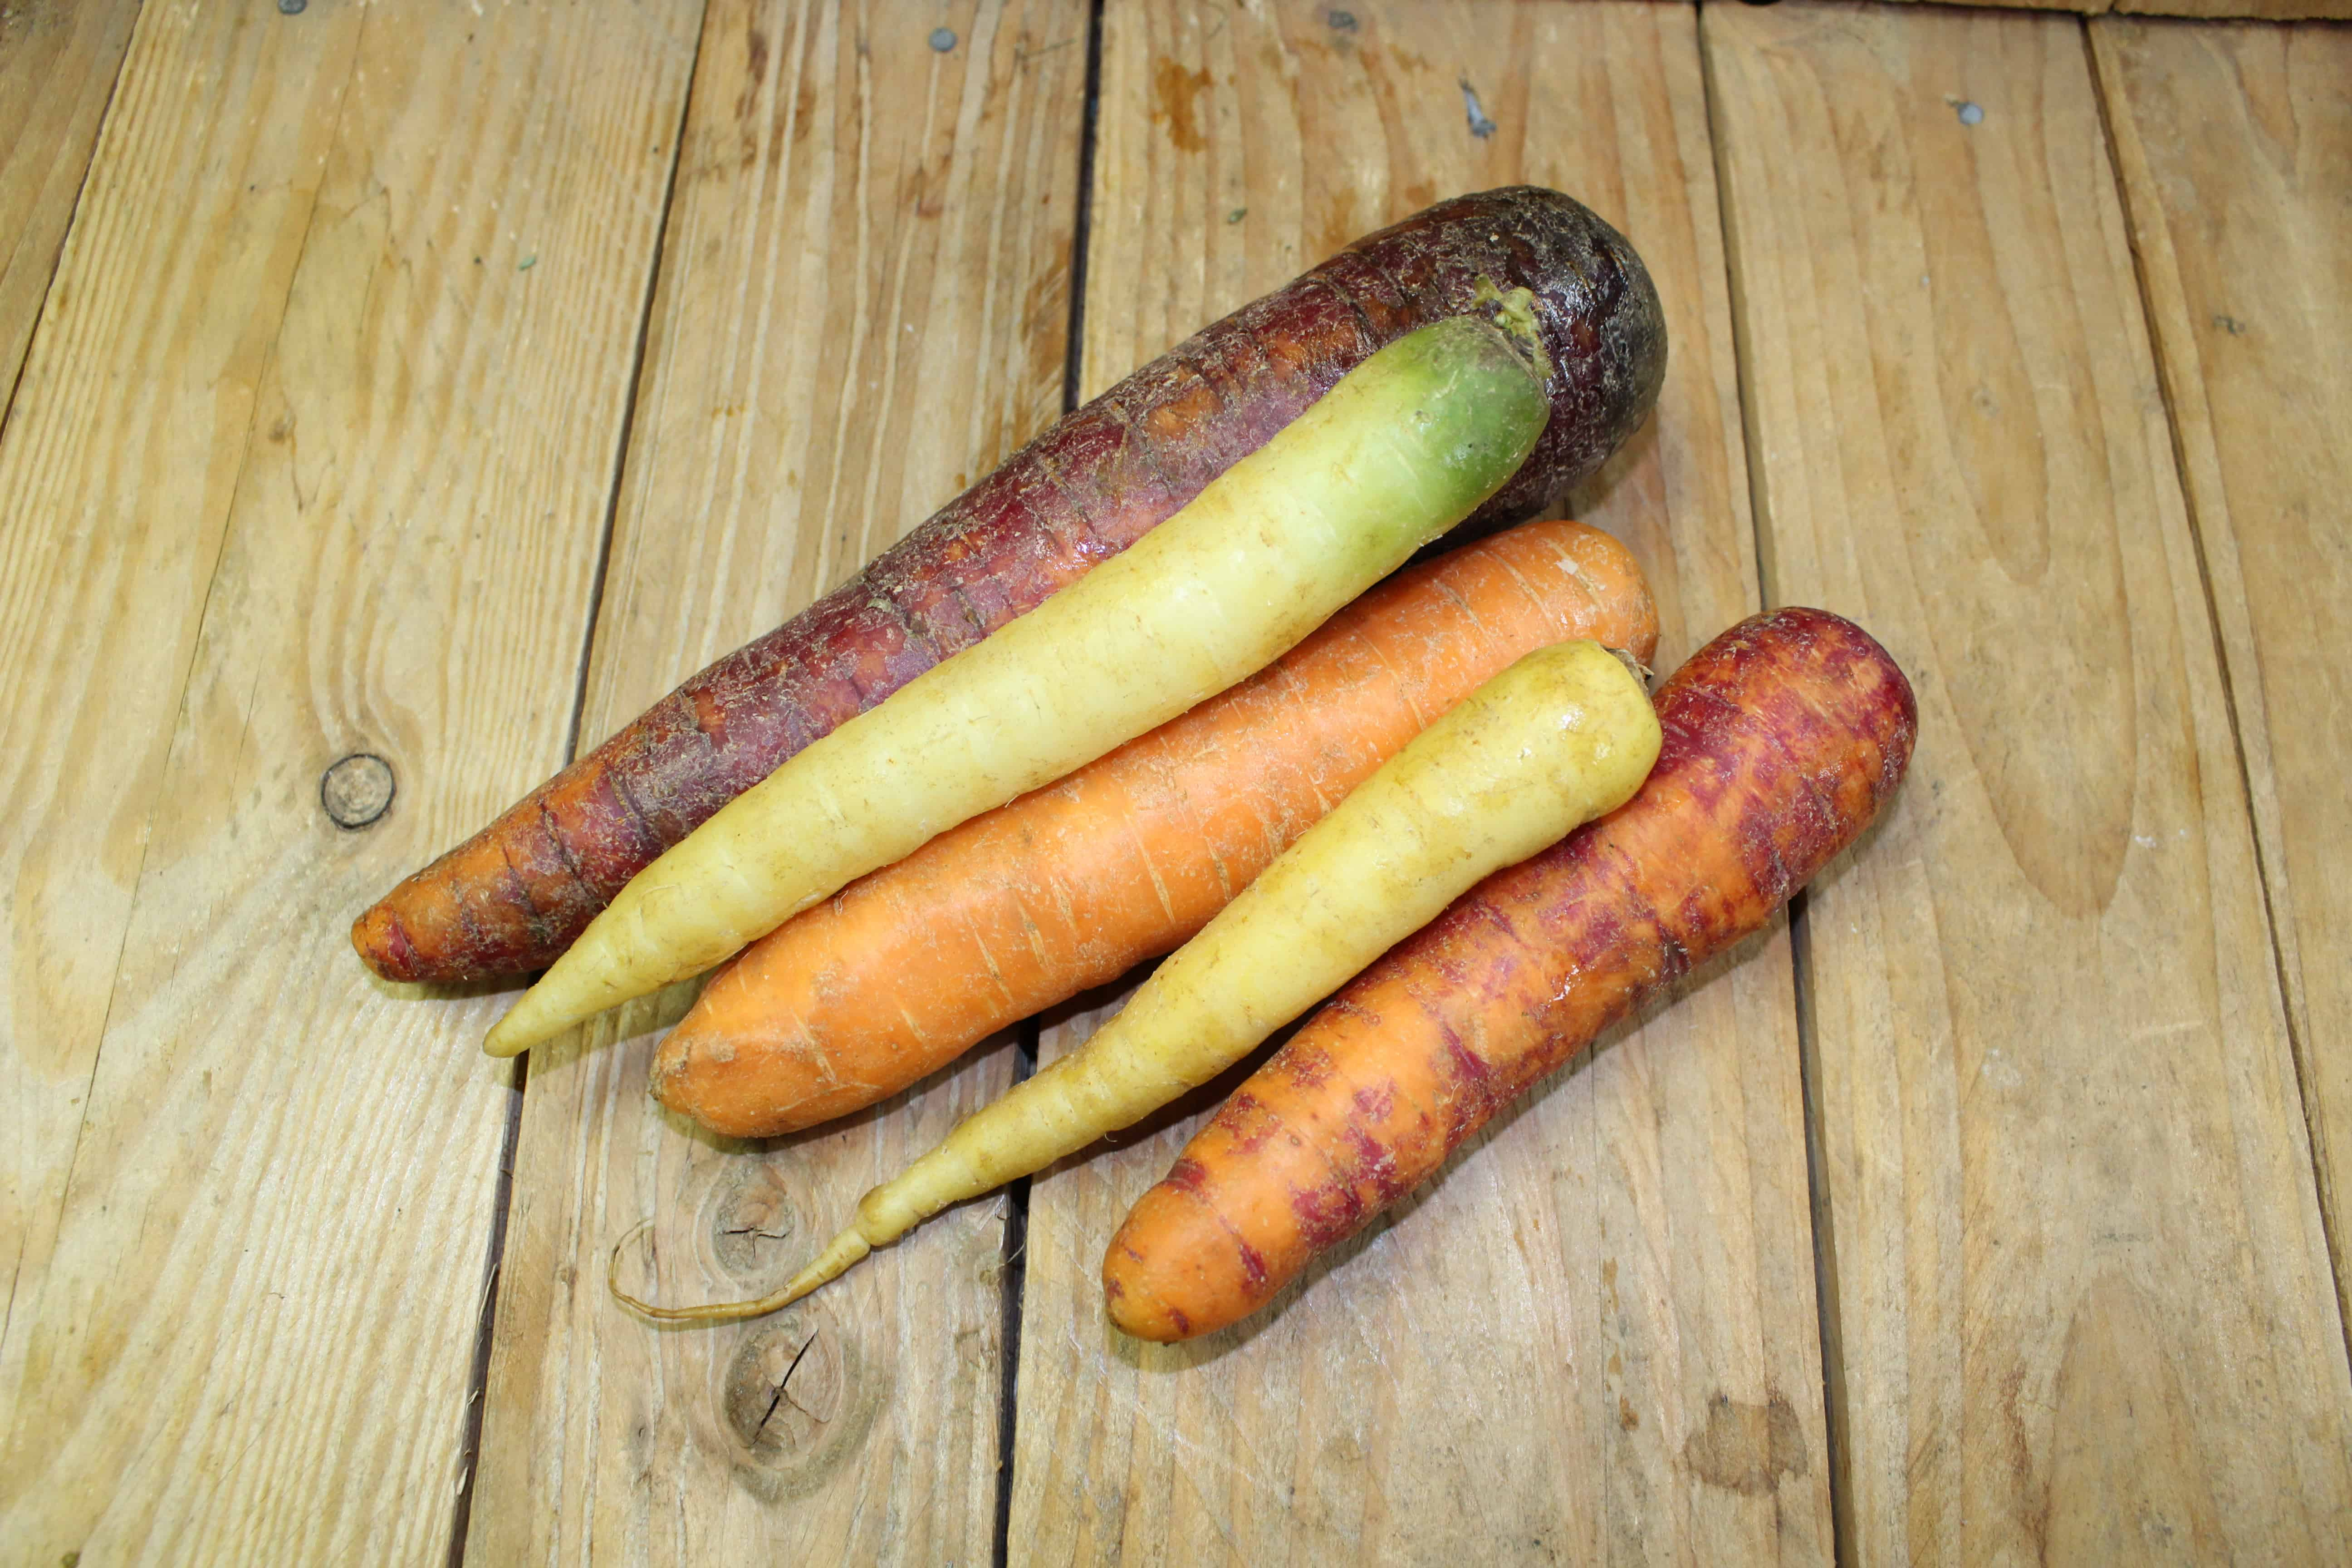 Carrots – Rainbow ONTARIO Pfenning's Farm (2LB Bag)